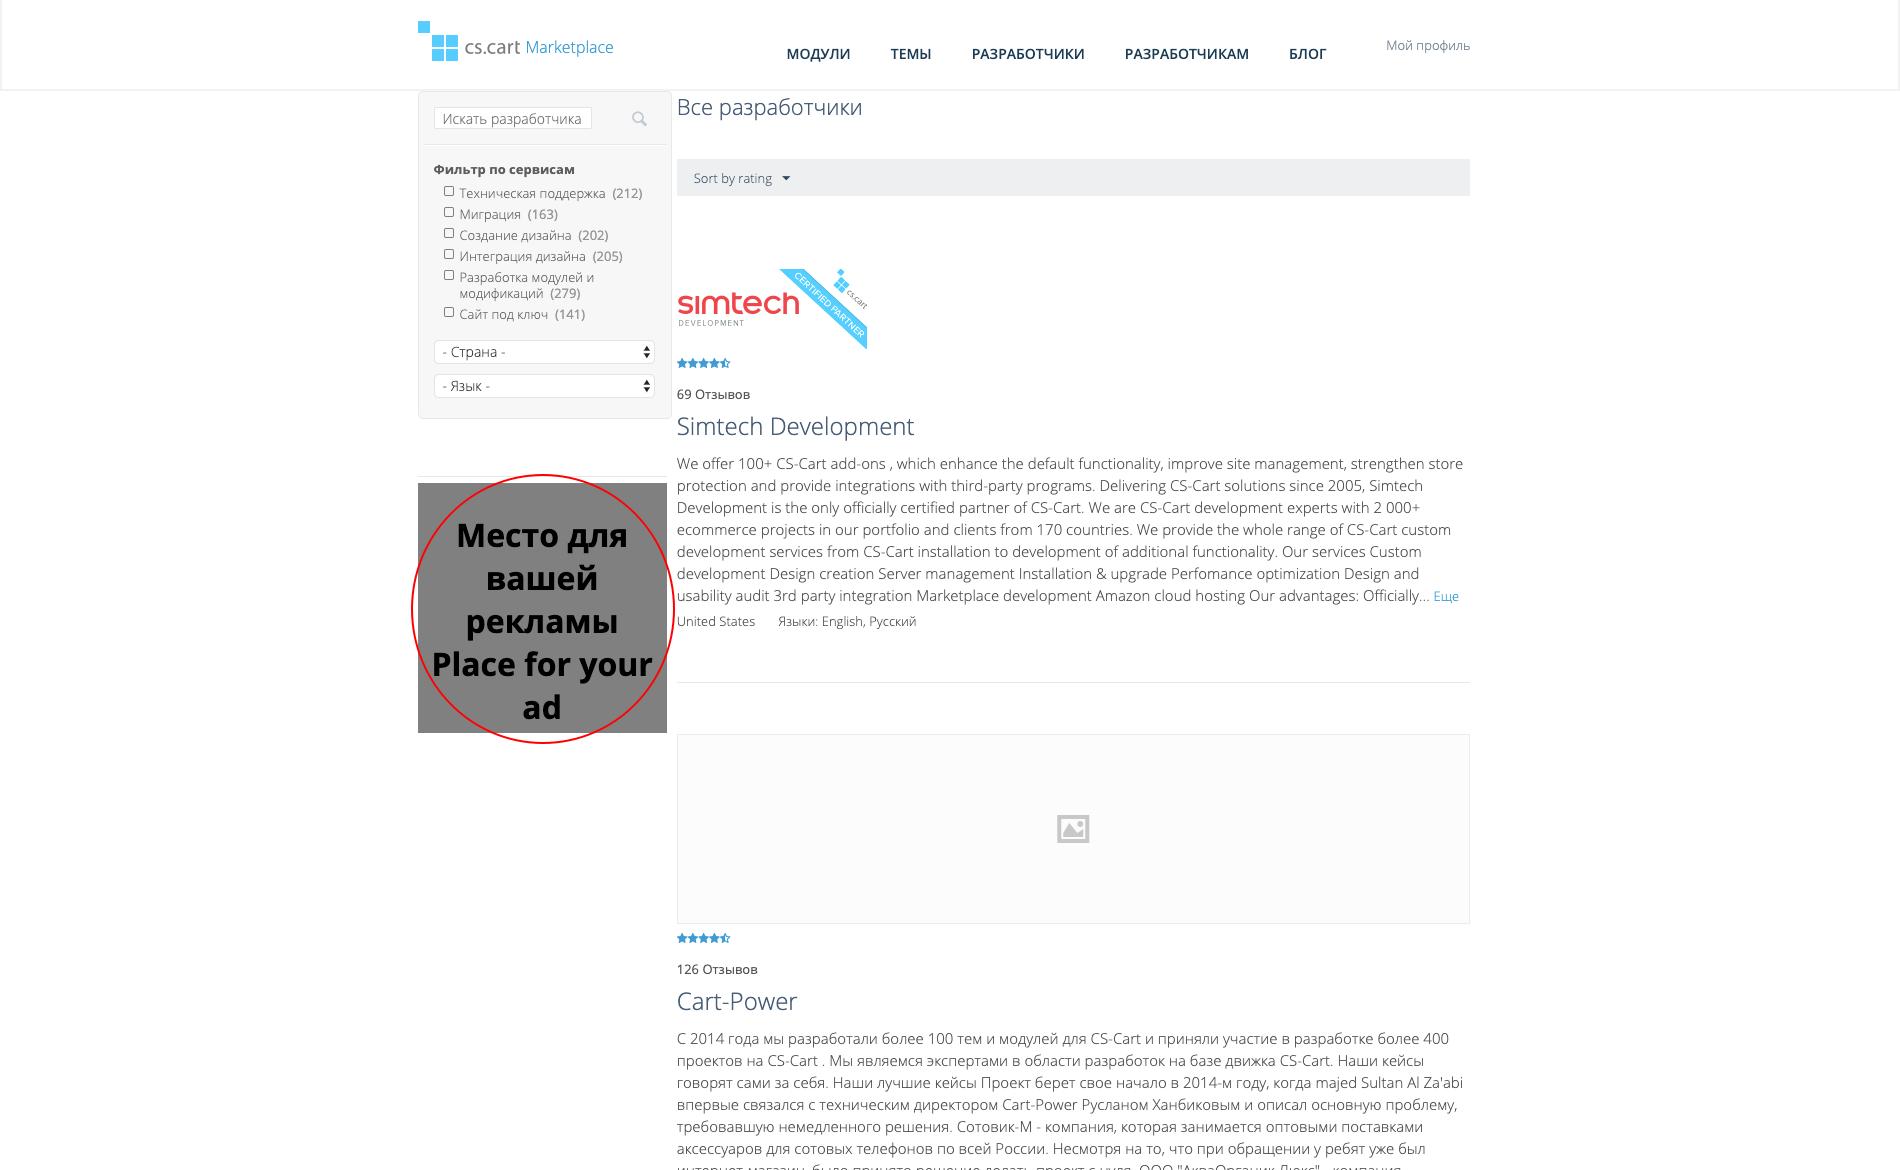 adMarket_developerlist.png?1570905449960